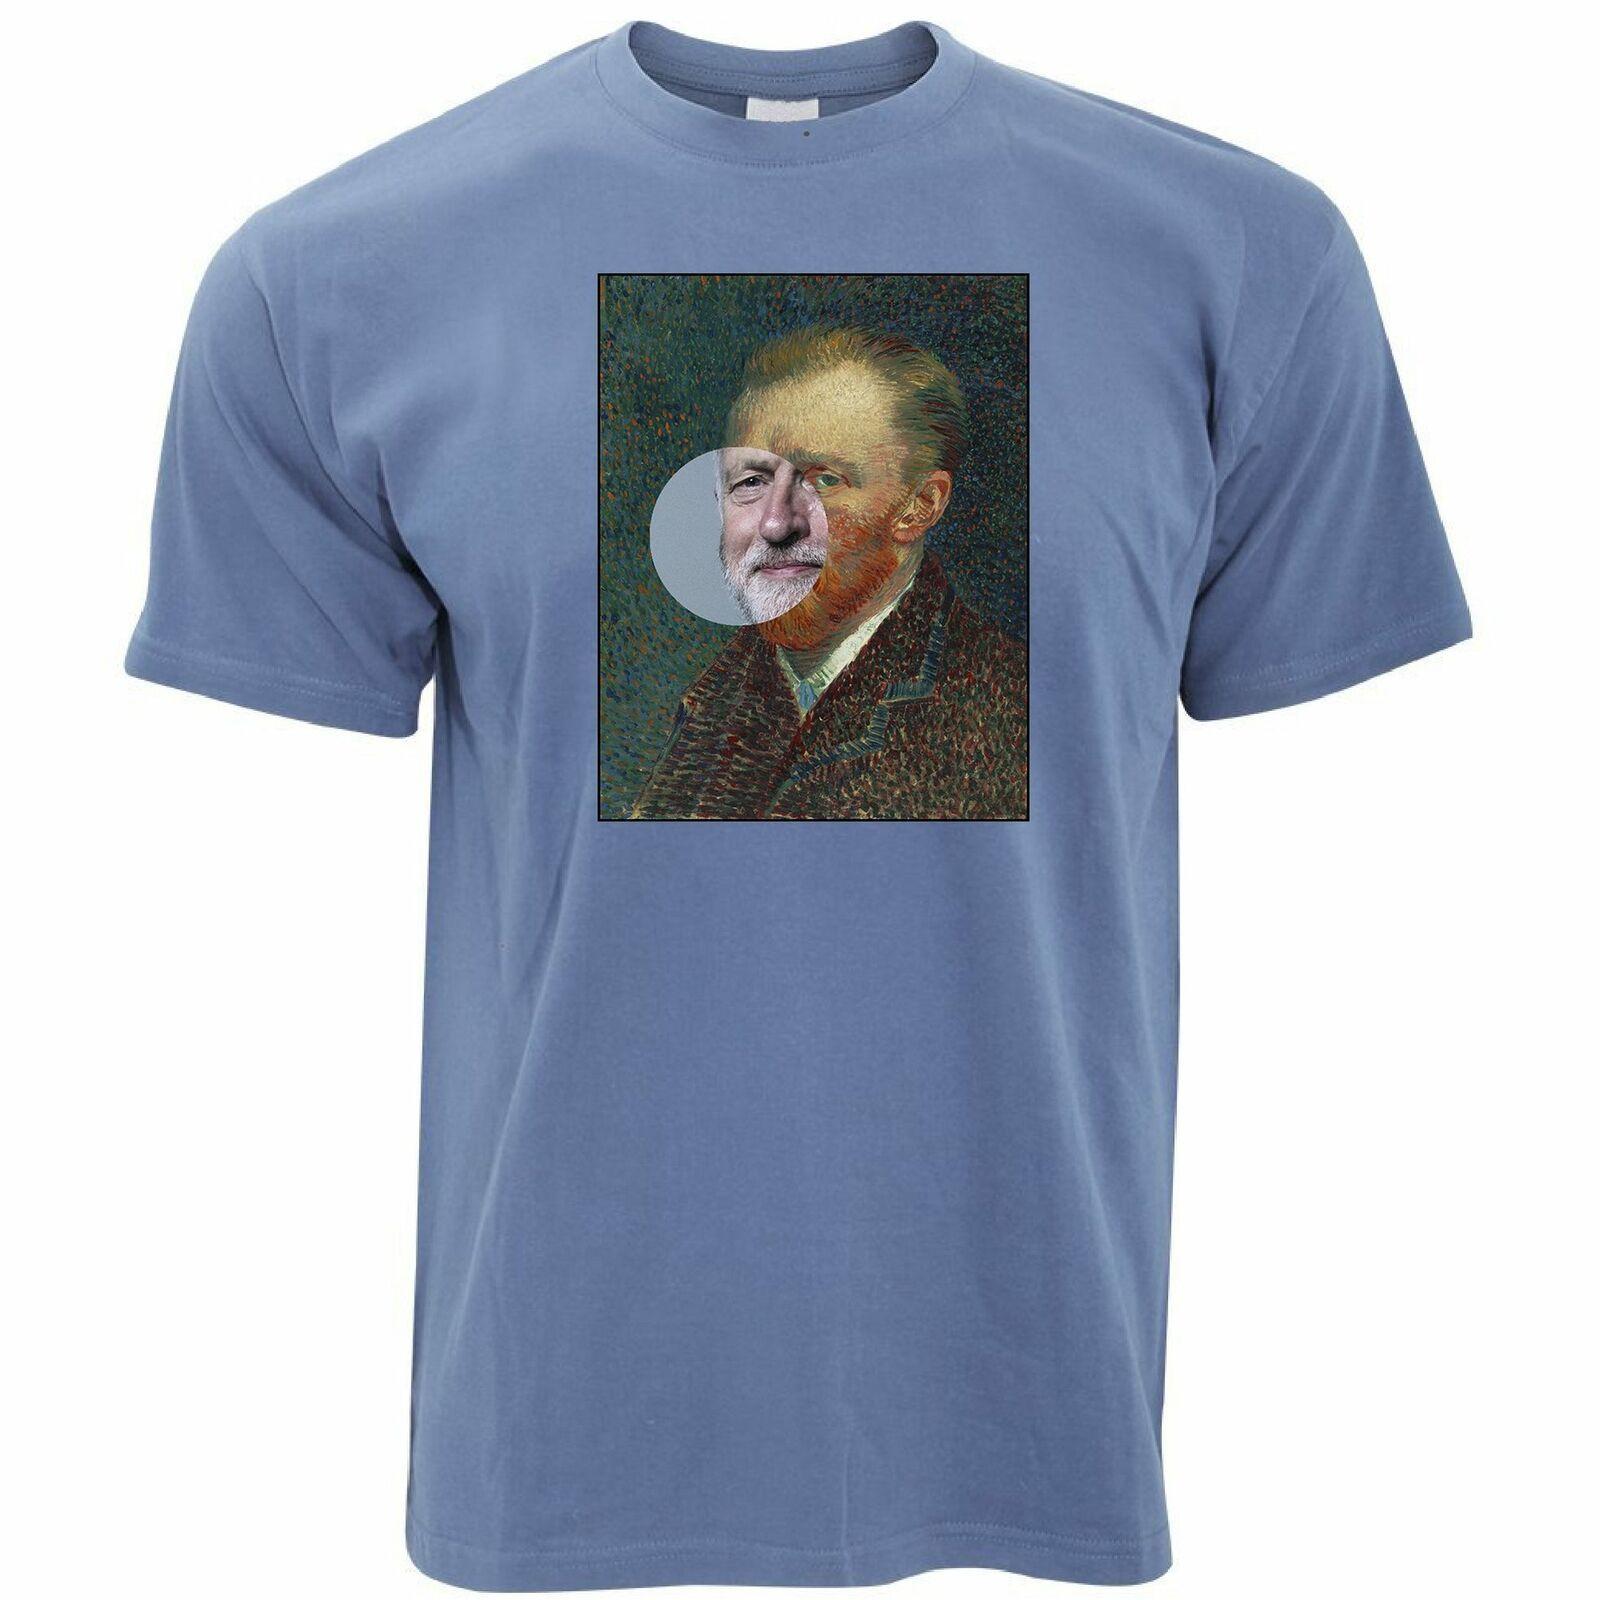 Political T Shirt Jeremy Corbyn Van Gogh Splice Political Art Collage 150